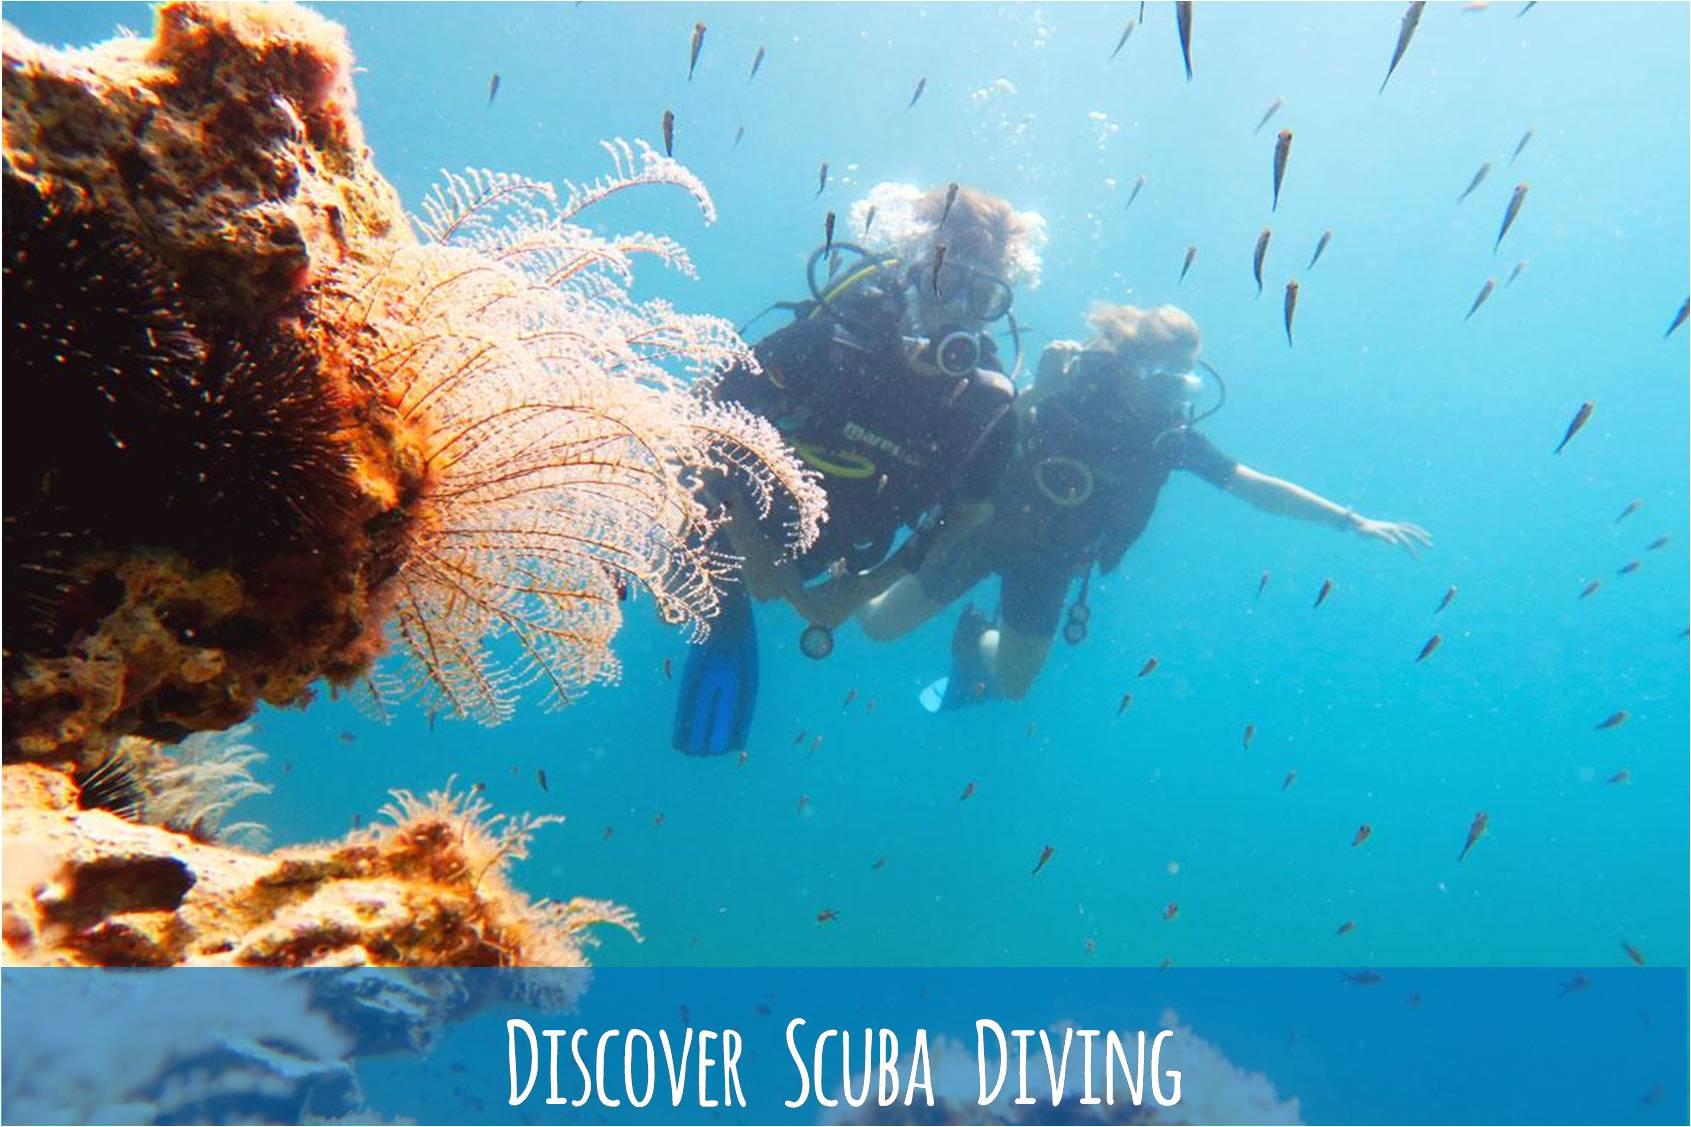 Bautizo / Discover Scuba Diving